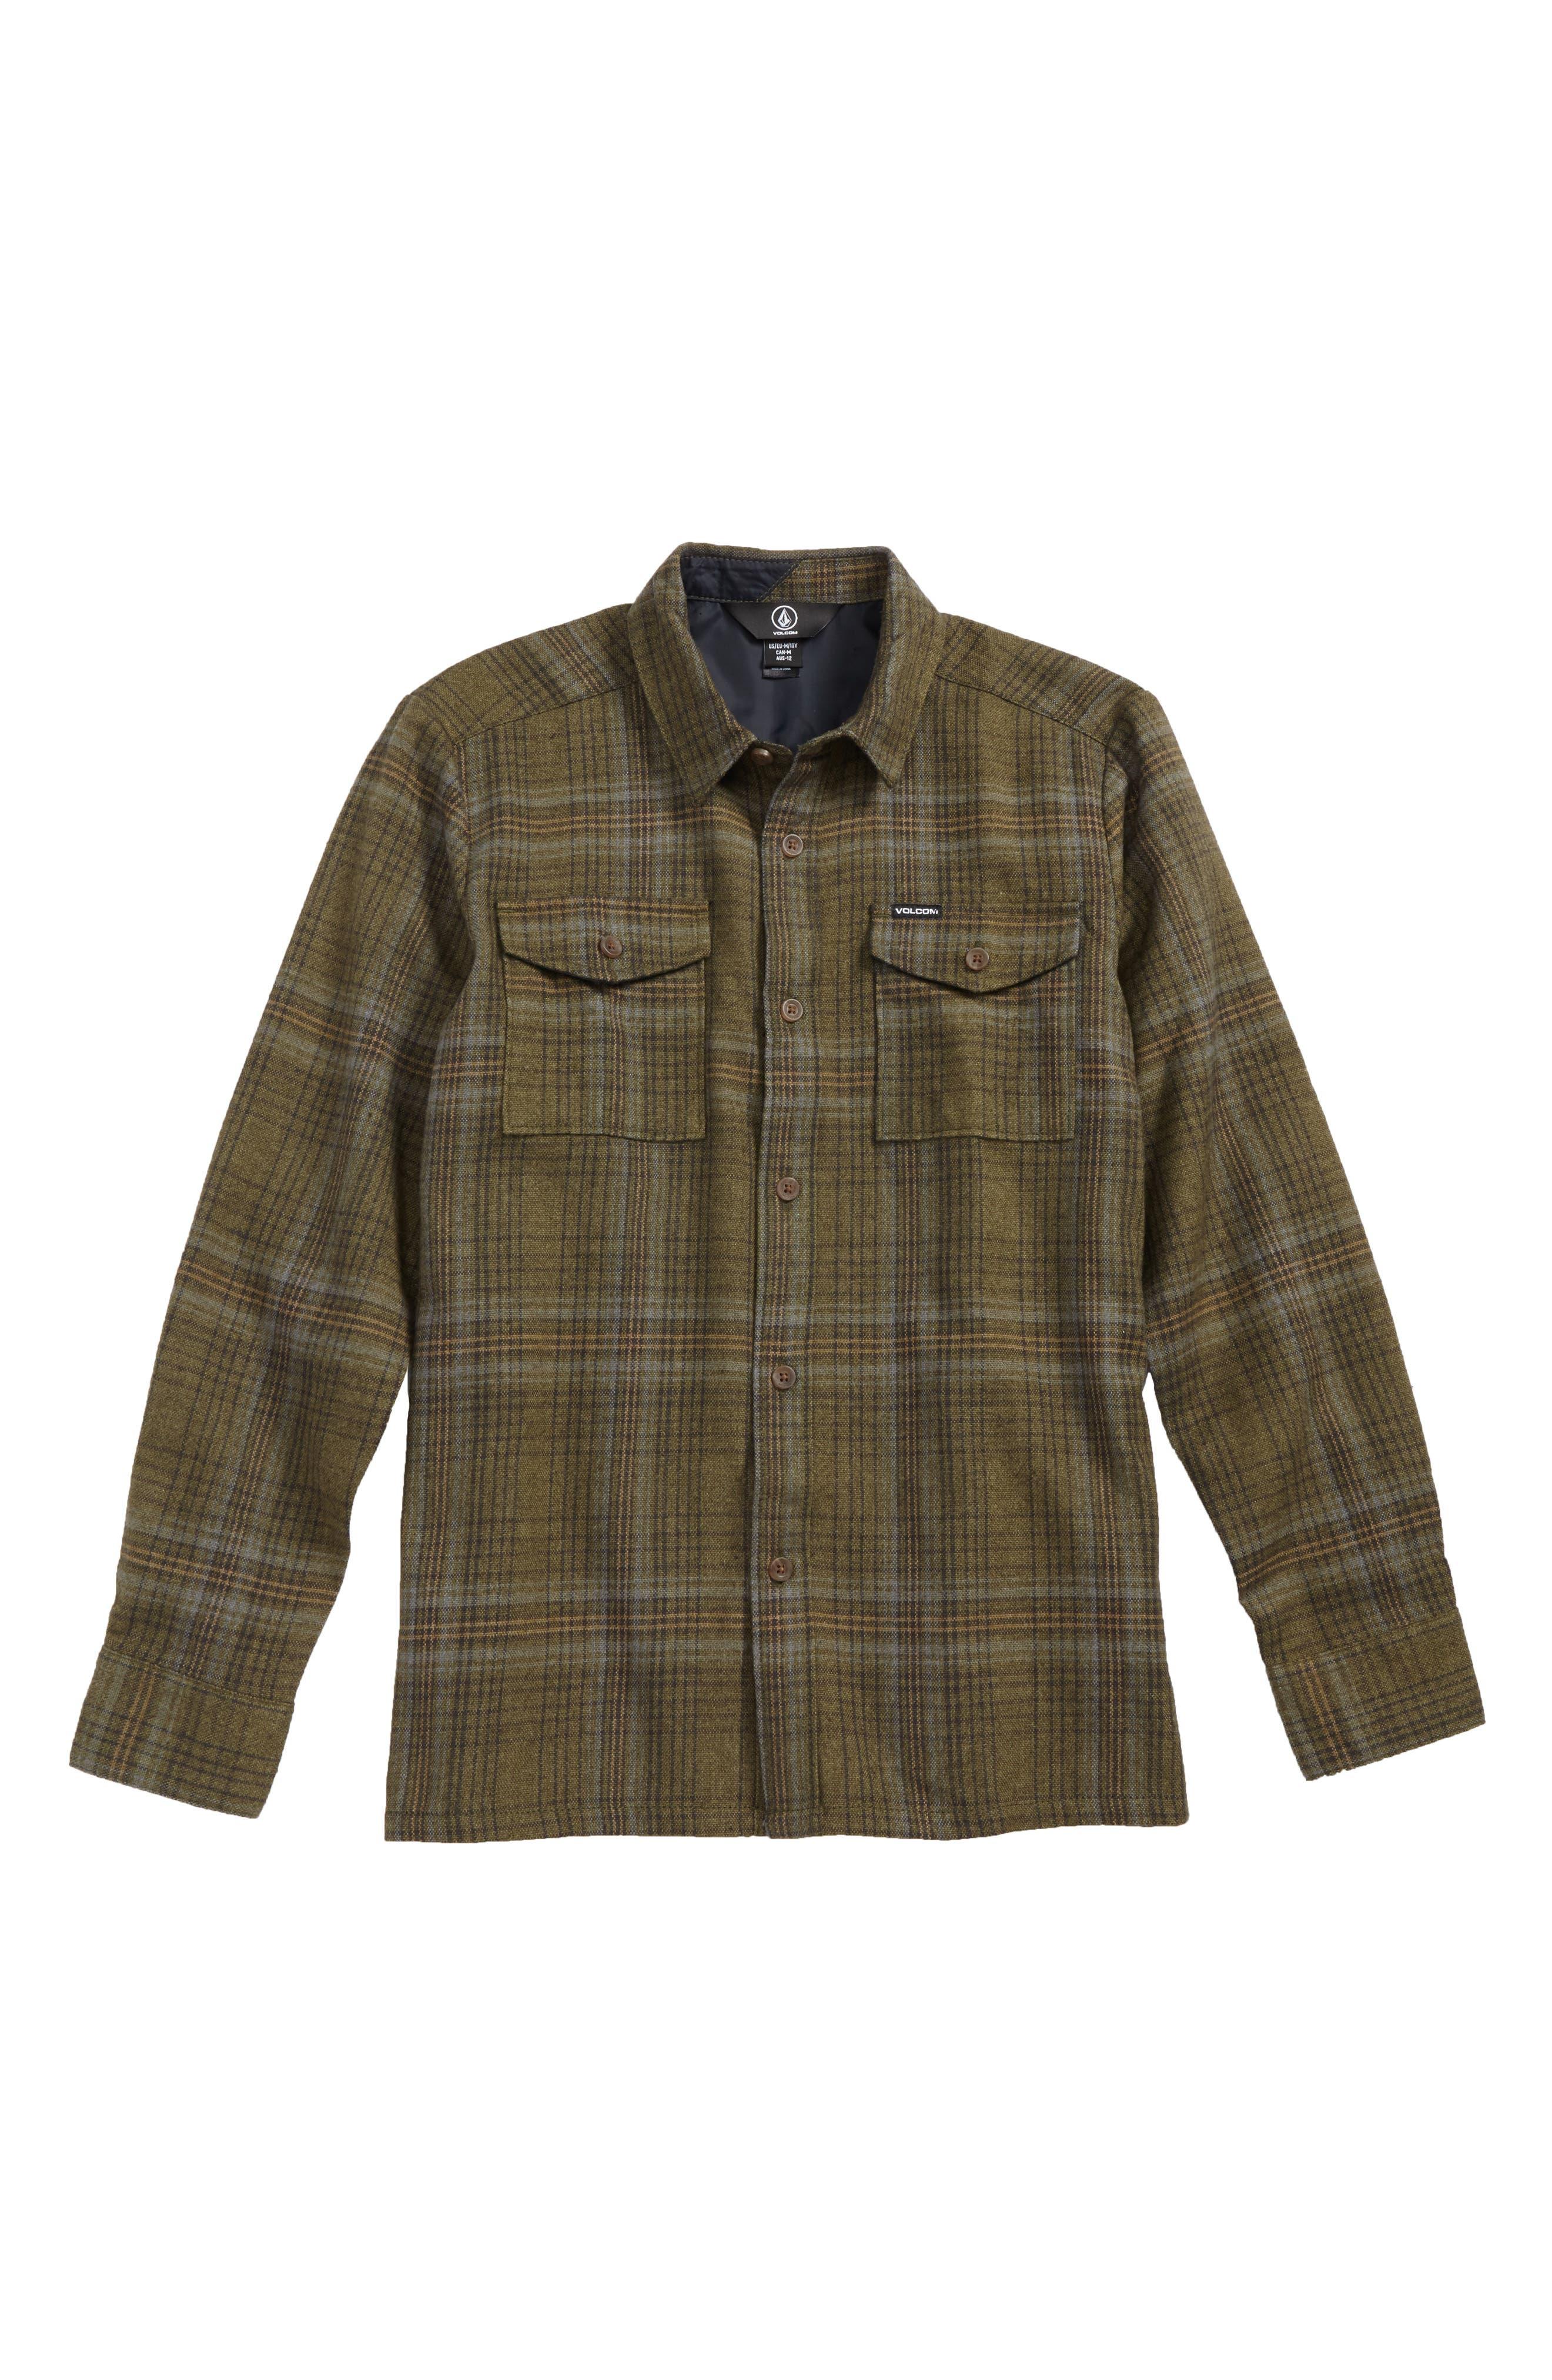 Bodhi Plaid Flannel,                         Main,                         color, Military